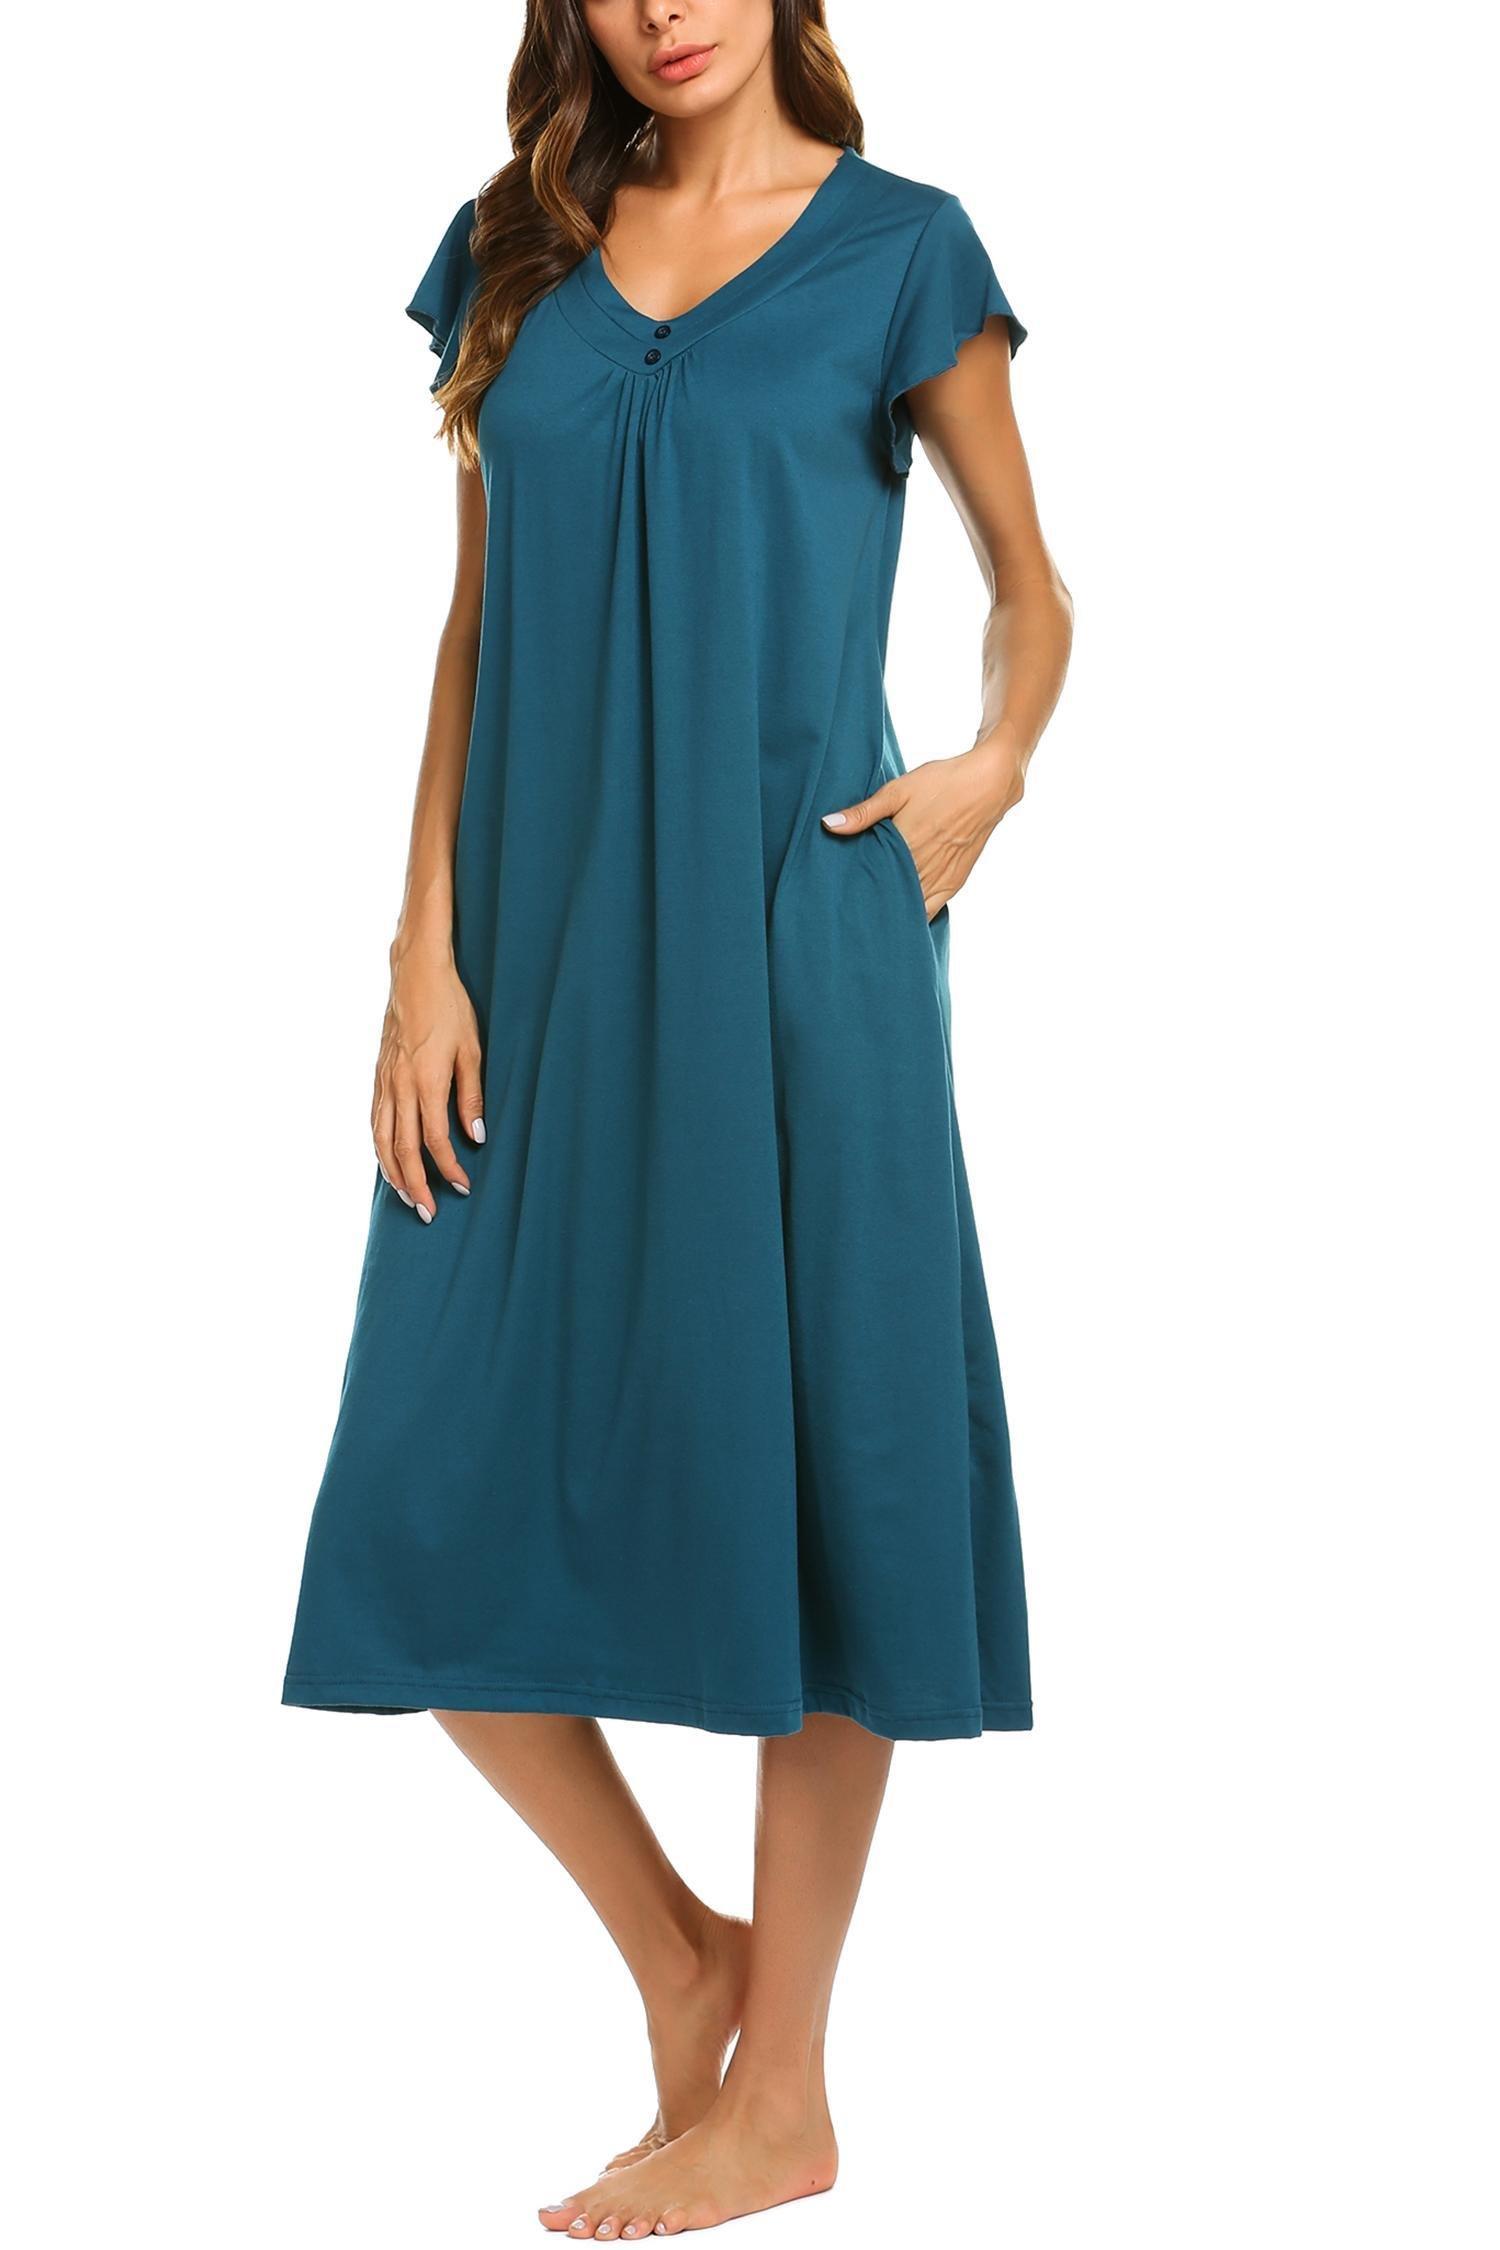 Goldenfox Oversize Cool Nightgown for Ladies Loose Summer Nightwear Pajama Dress (Green, XX-Large)